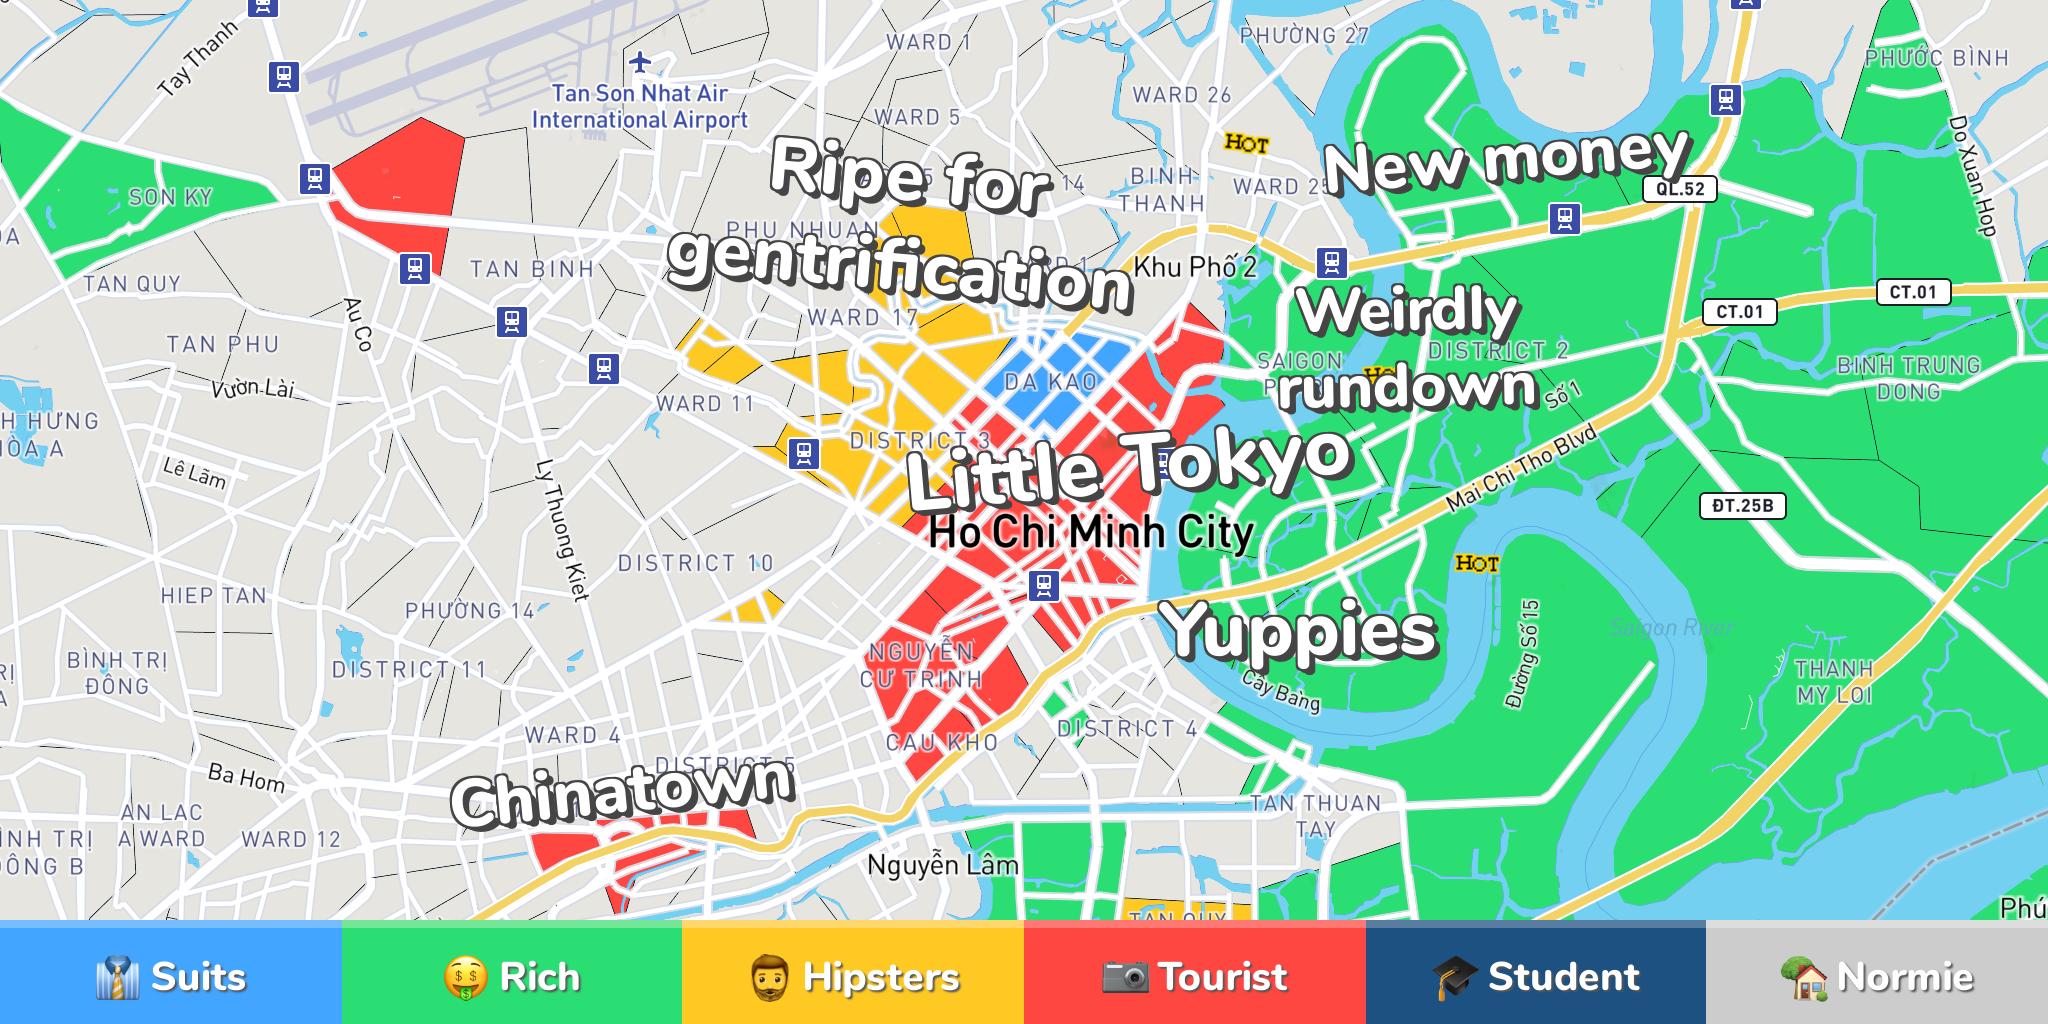 Ho Chi Minh City Neighborhood Map